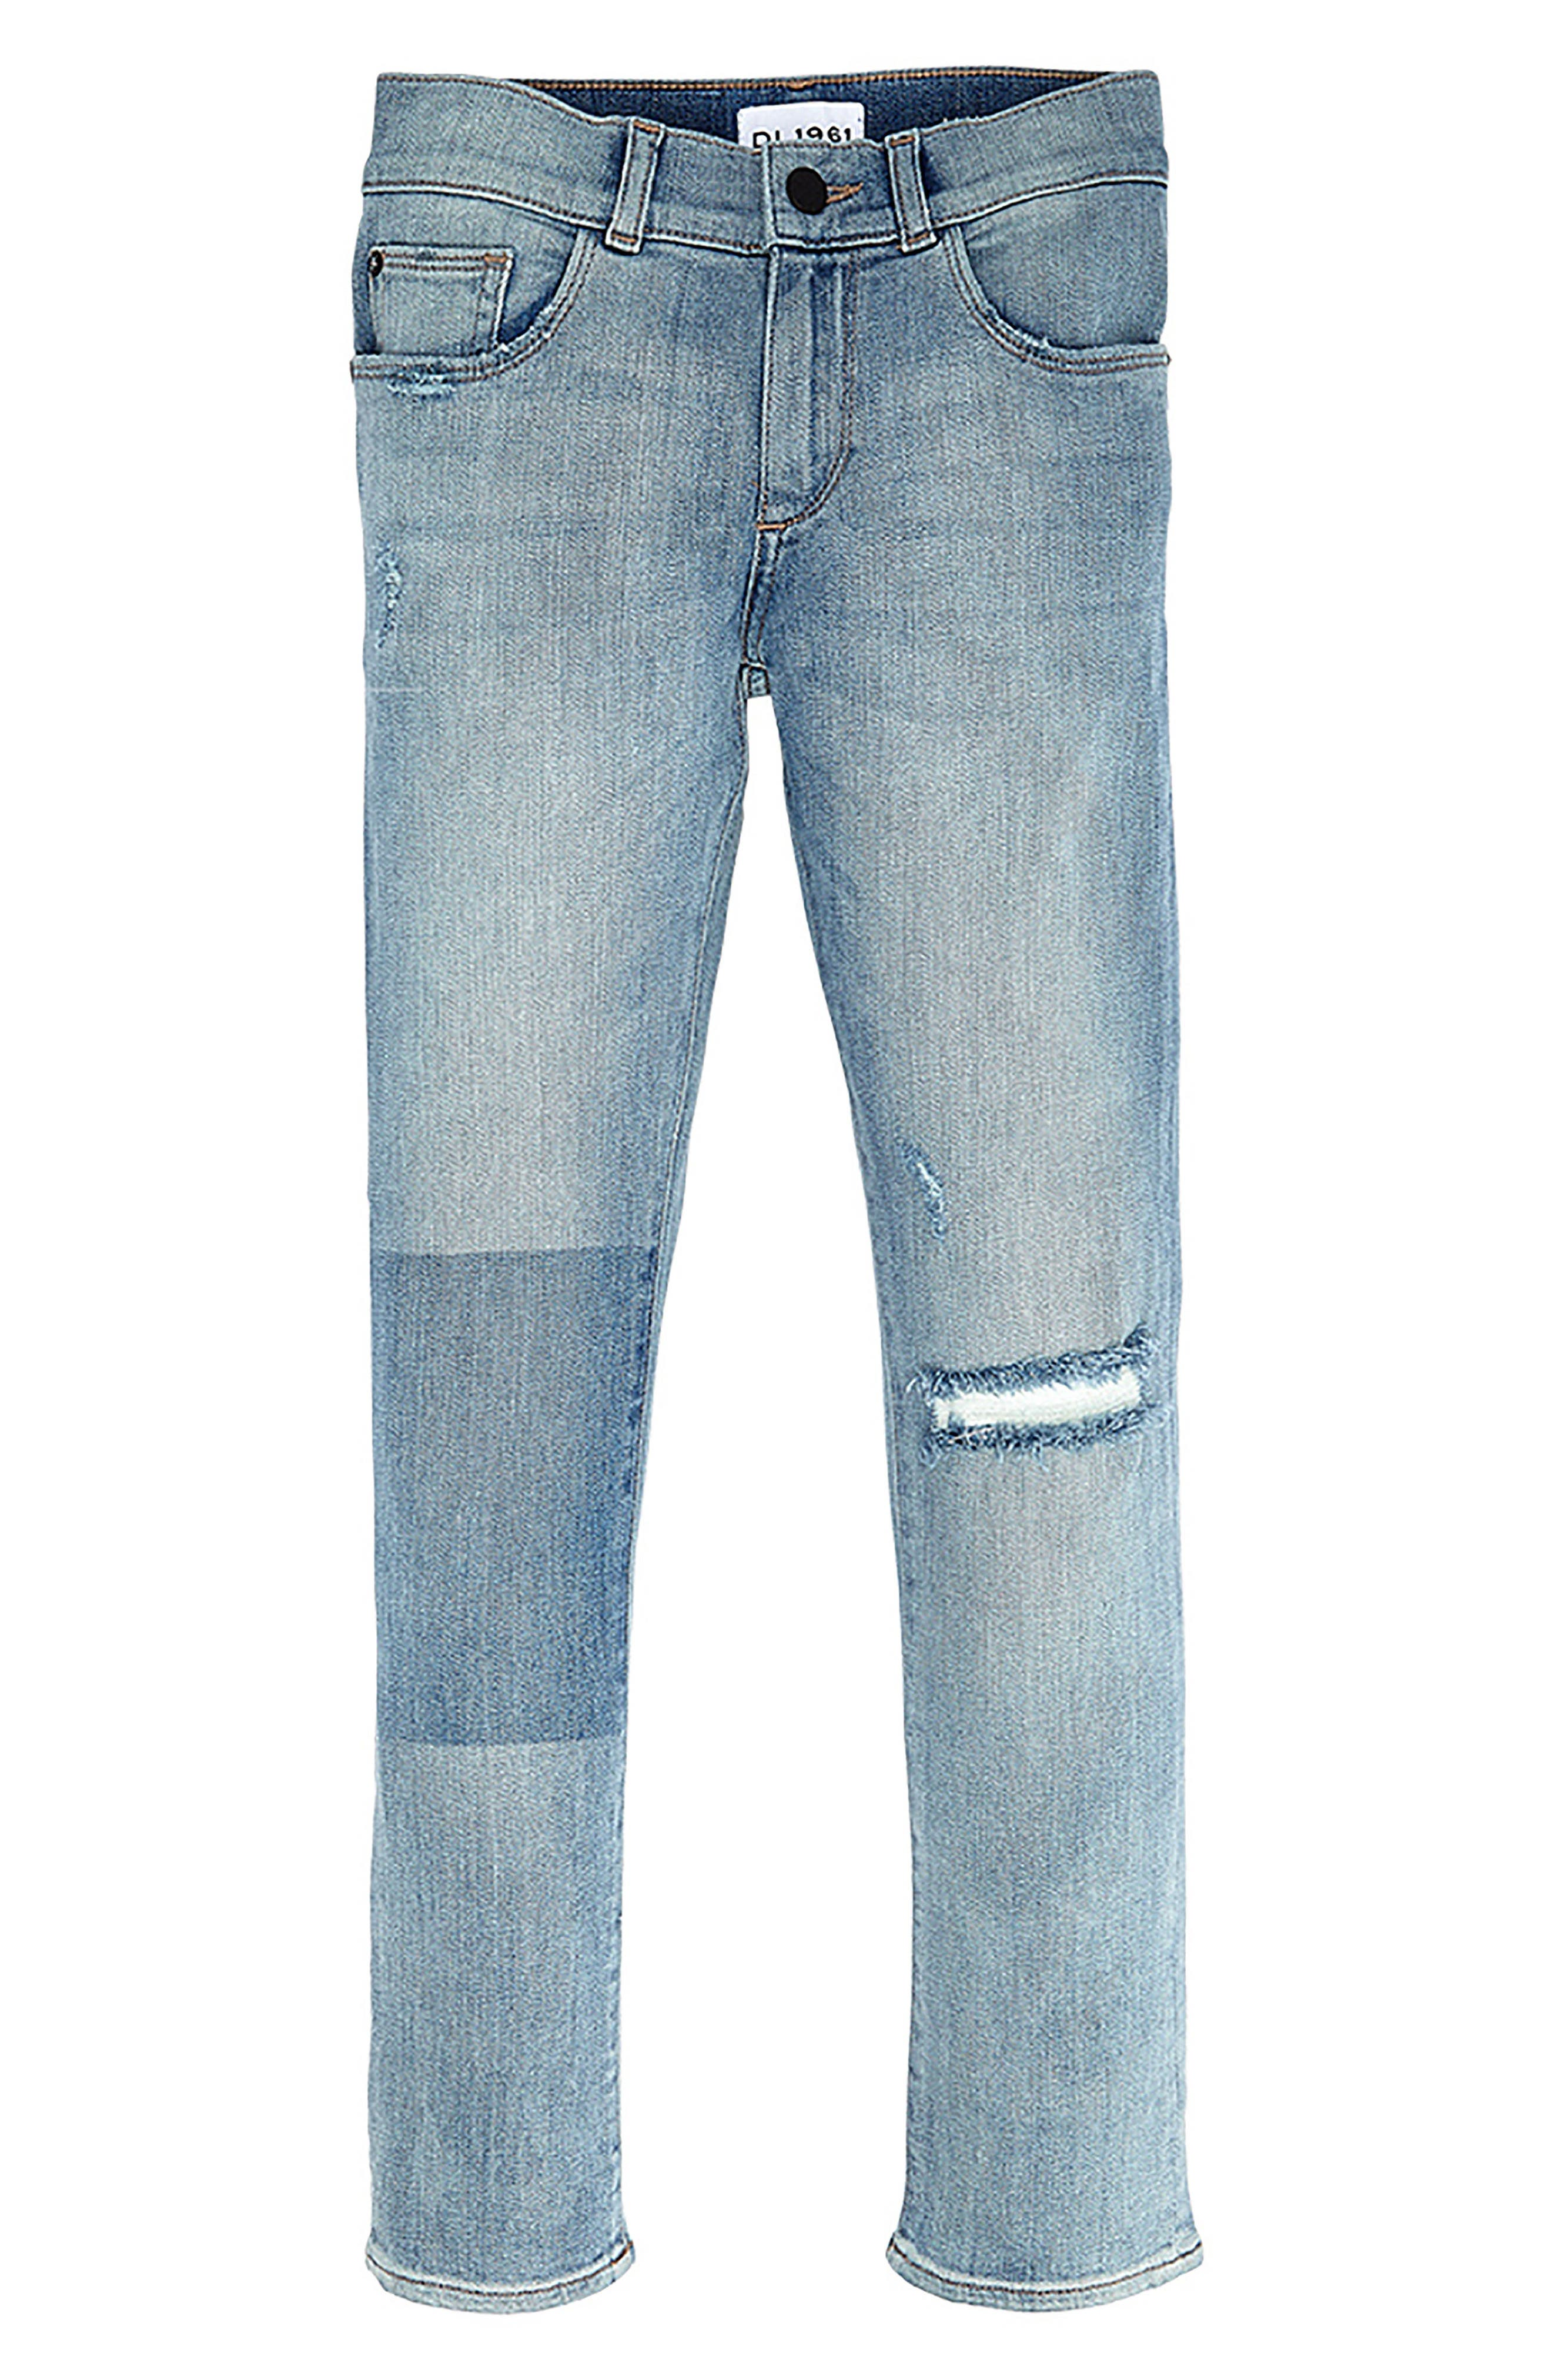 DL 1961 Hawke Skinny Jeans,                         Main,                         color, Brain Freeze